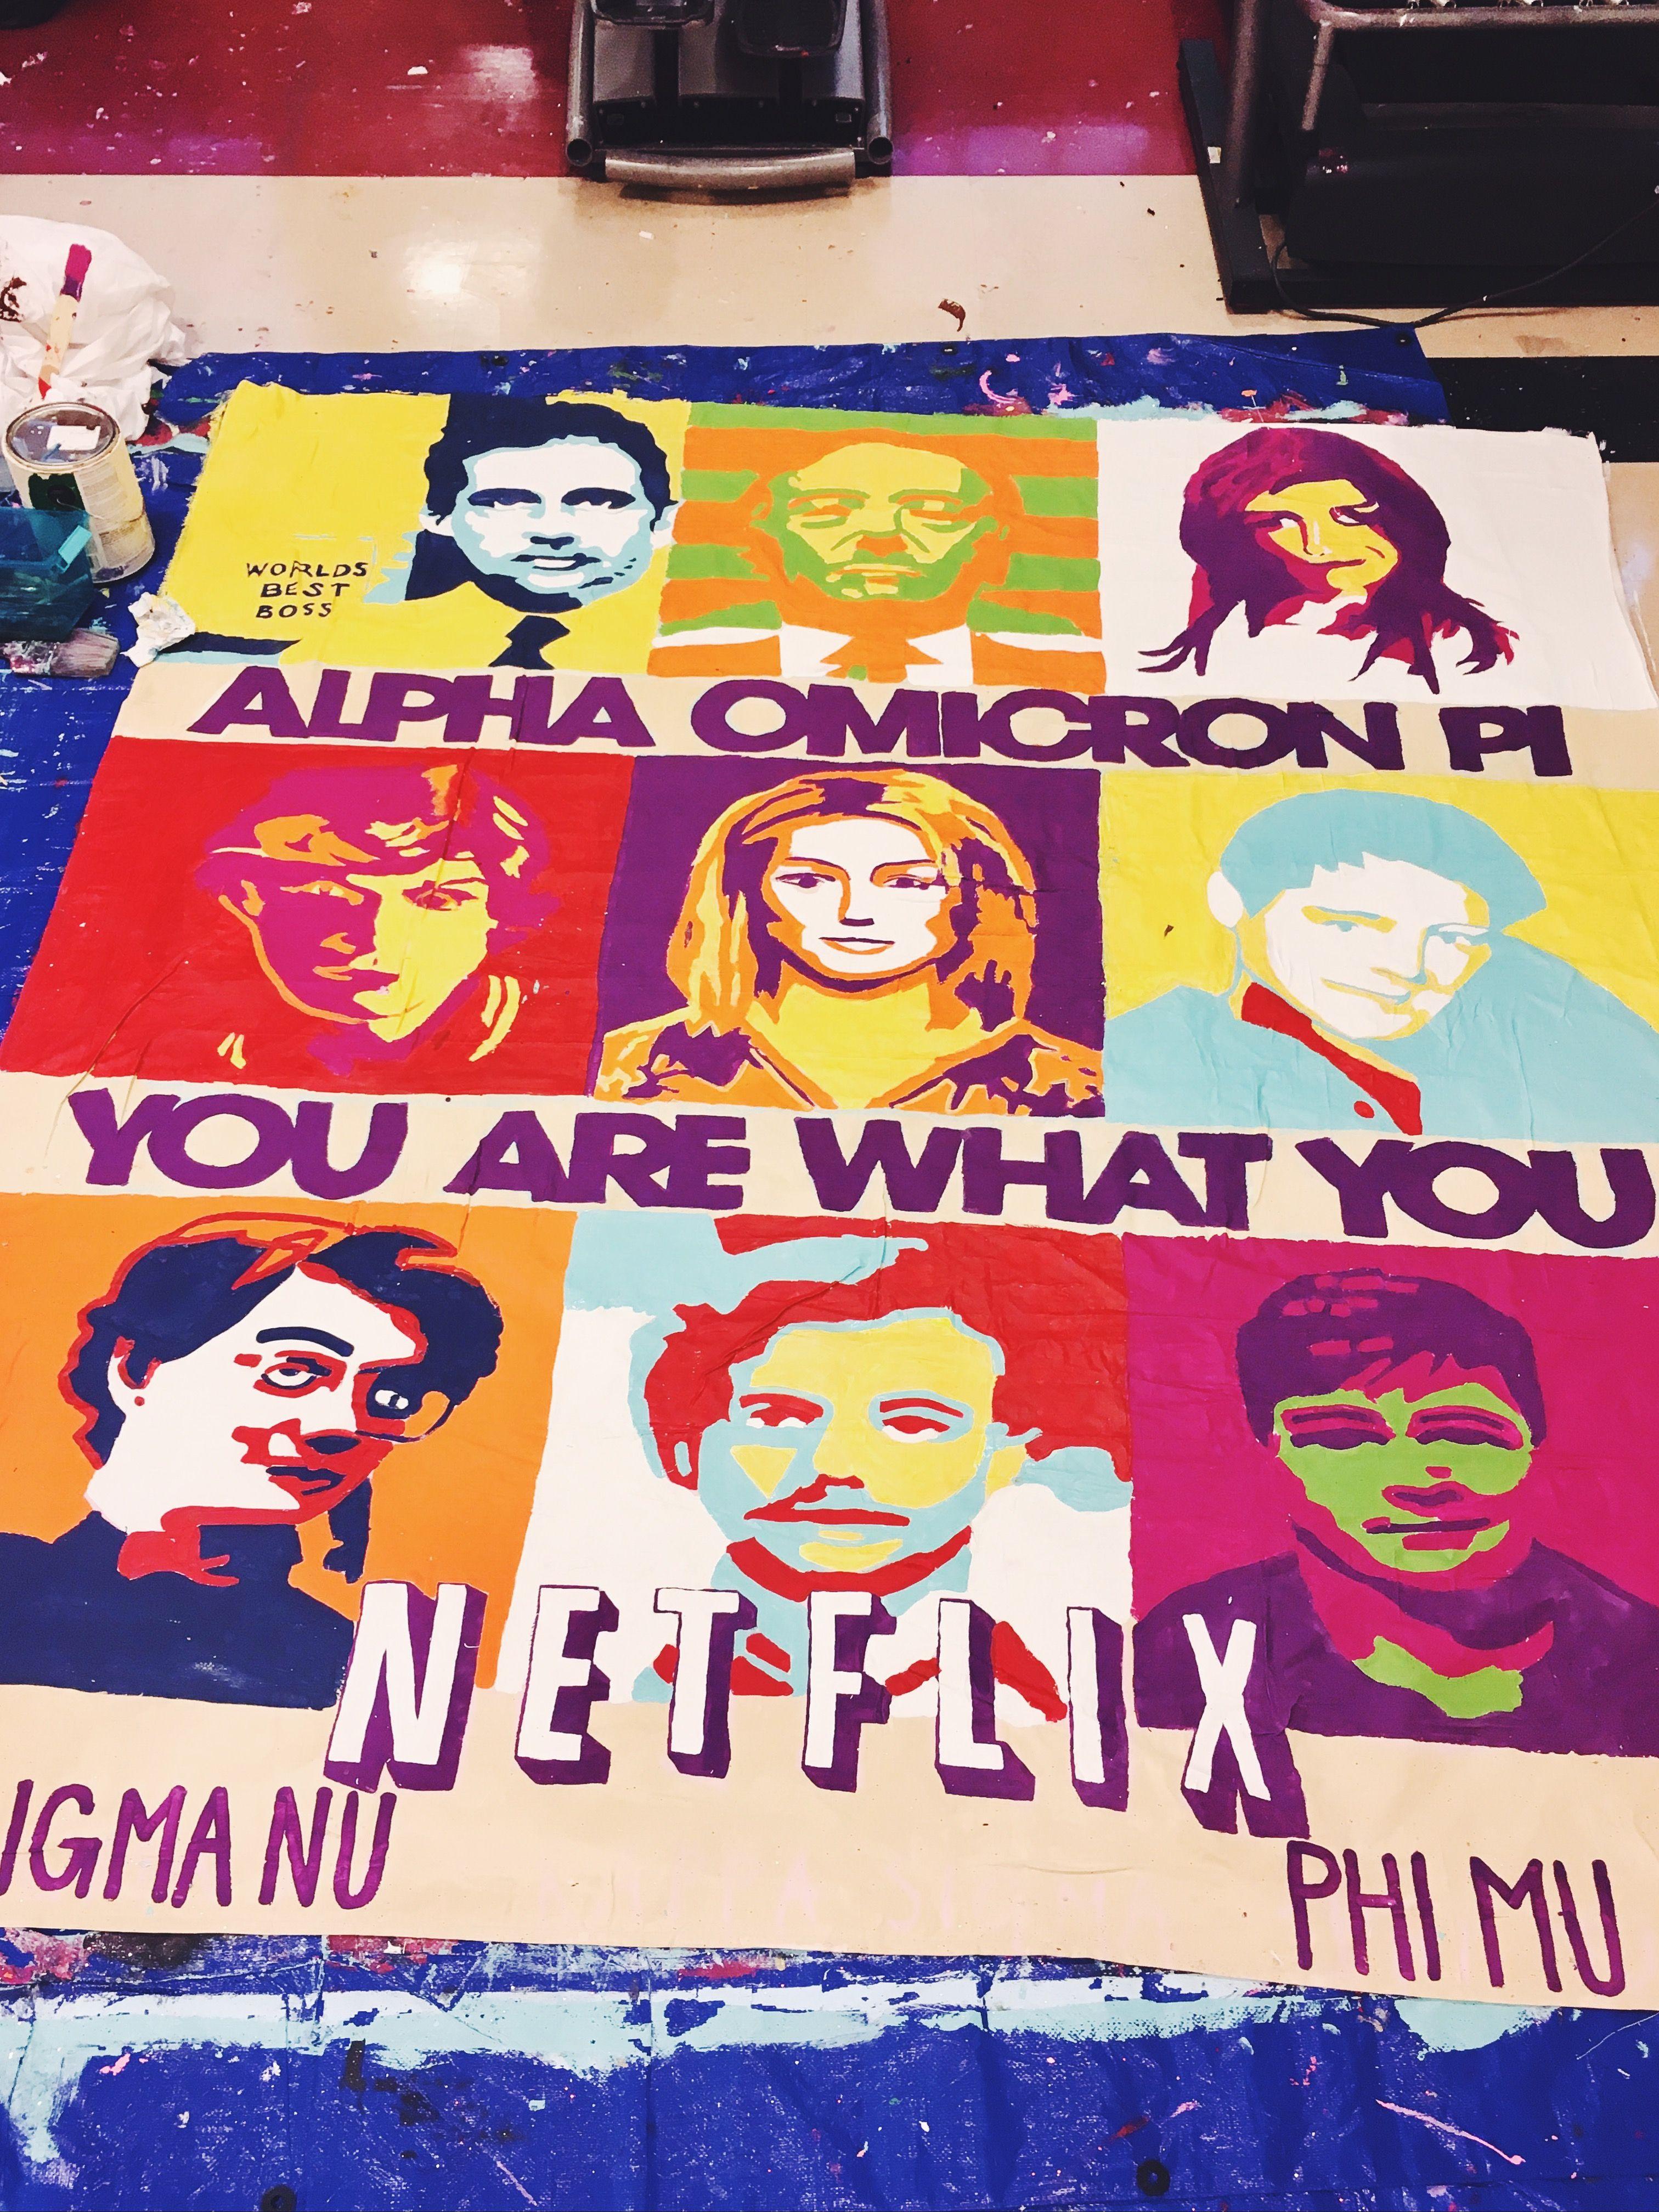 university of arkansas alpha omicron pi aoii sorority banner